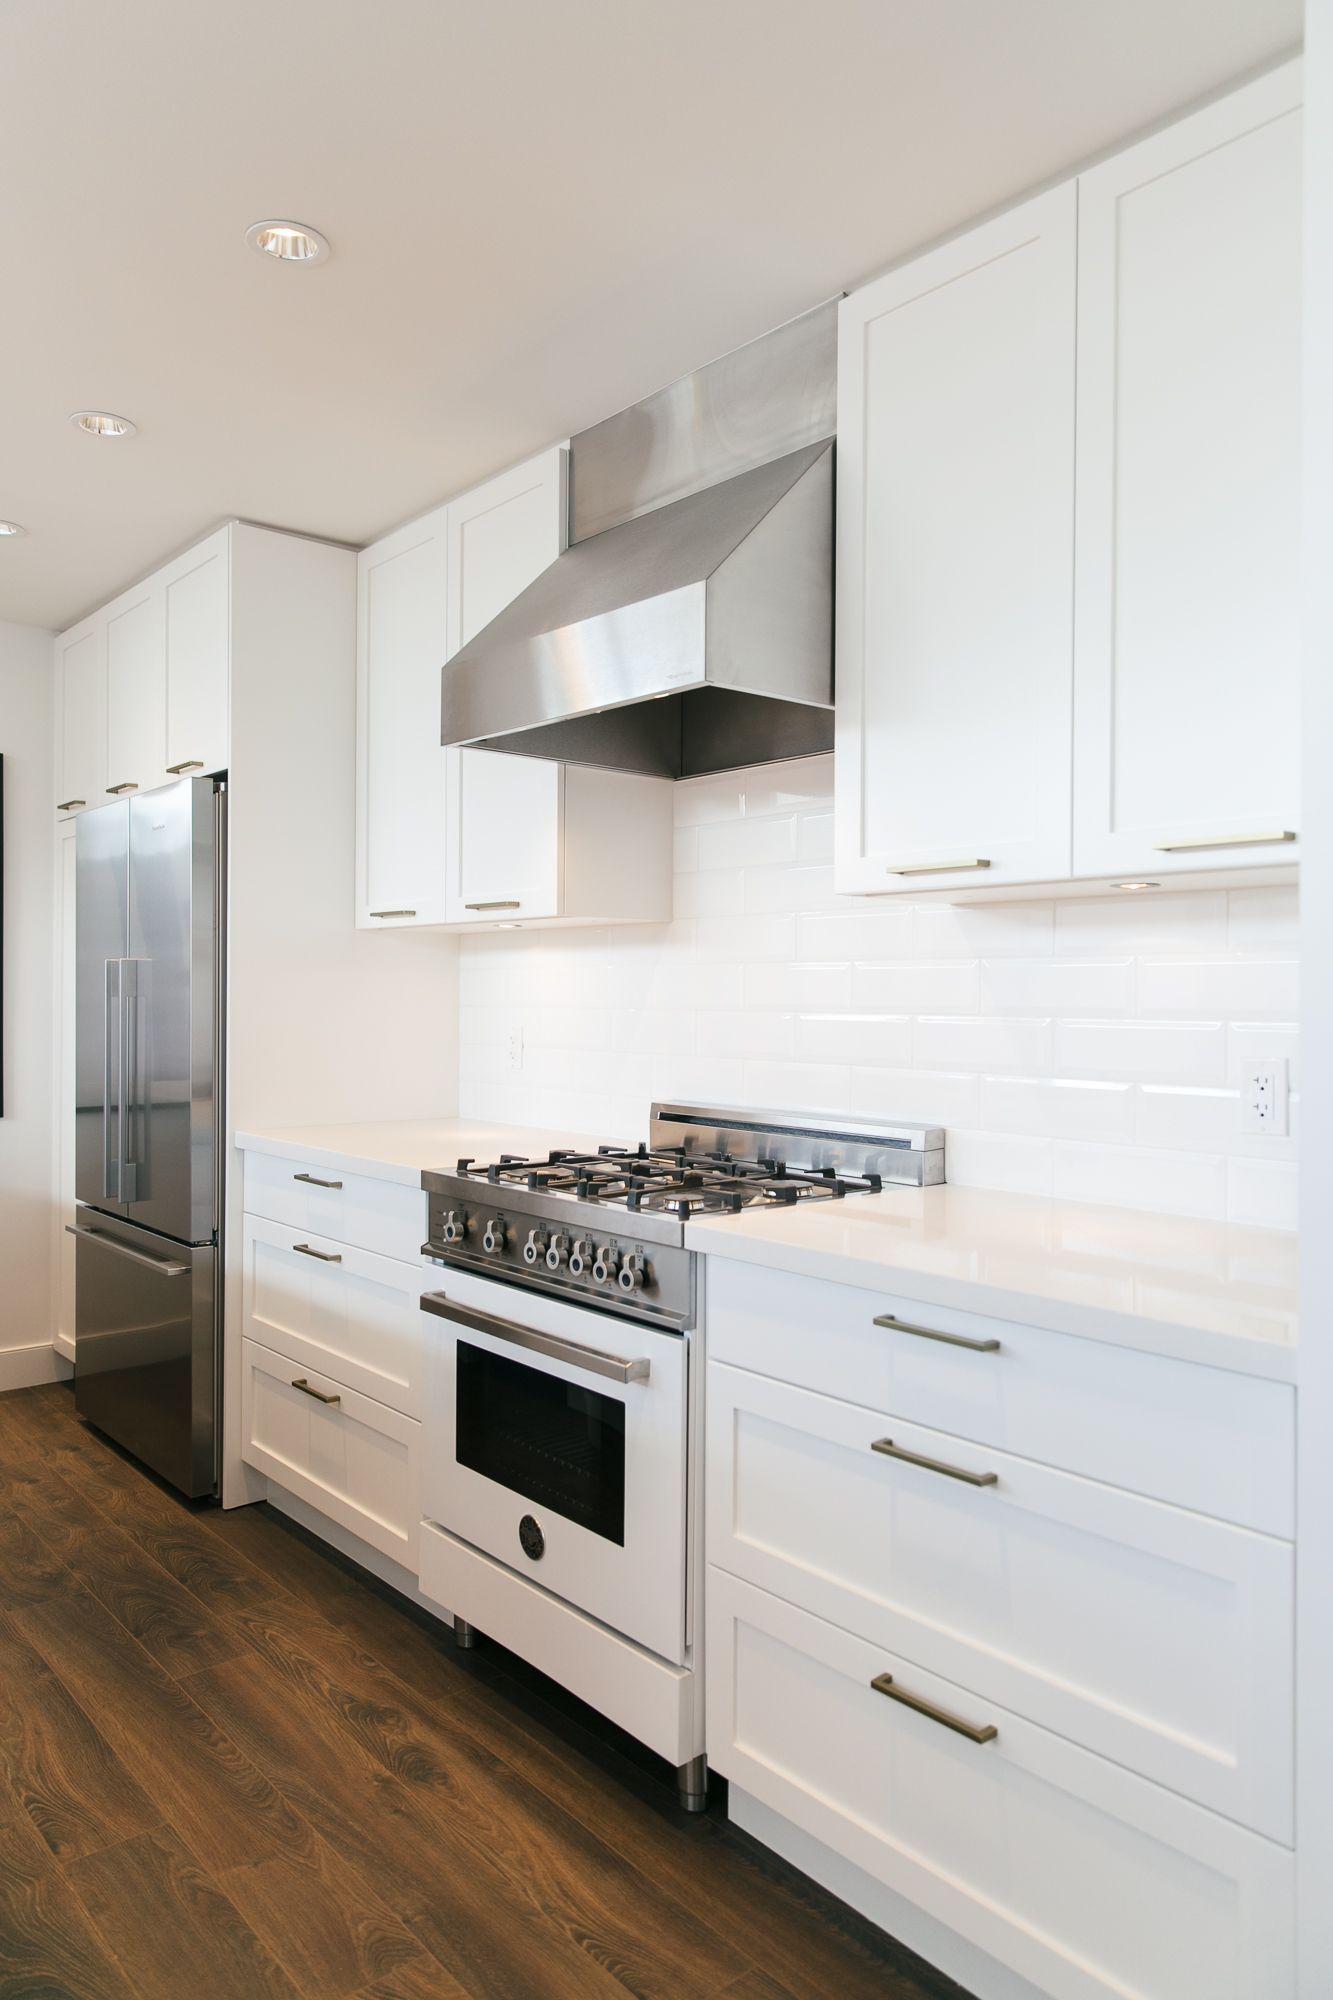 James Walk Kitchen Bertazzoni Range Dropped Ceilings Peninsula Kitchen With Contemporary Kitchen Cabinets Kitchen Cabinet Remodel Kitchen Cabinet Styles